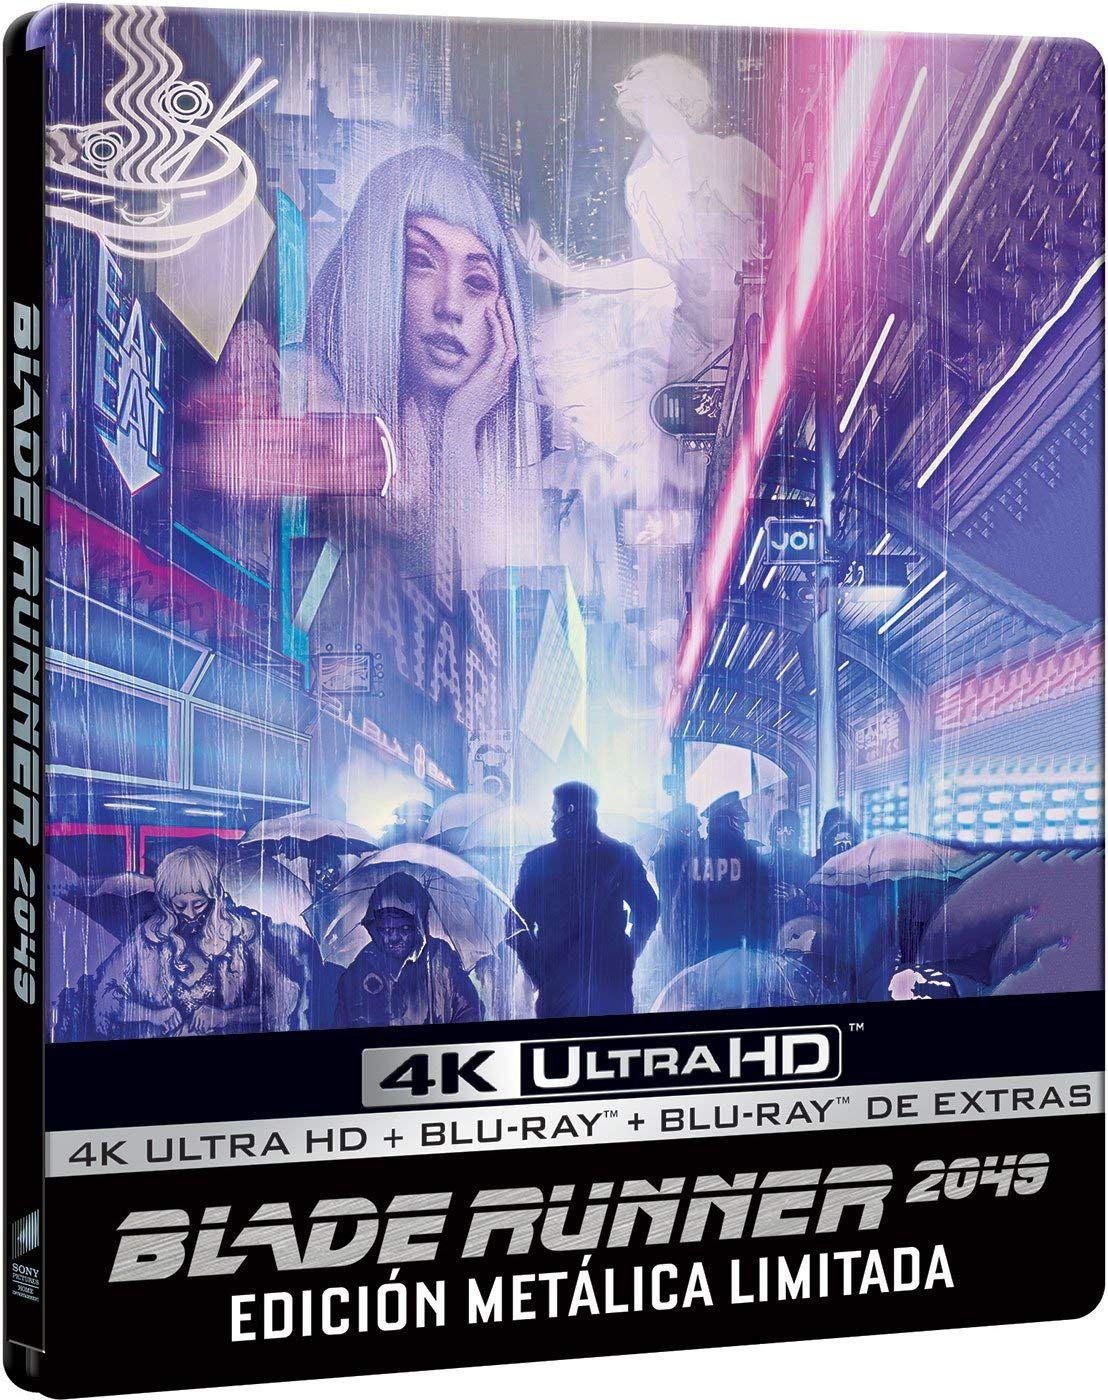 Blade Runner 2049 4k Uhd Bd Bd Extras Edici N Especial Metal Limitada Blu Ray Uhd Bd Extras Blade Blade Runner Chica Cyberpunk Arte Cyberpunk